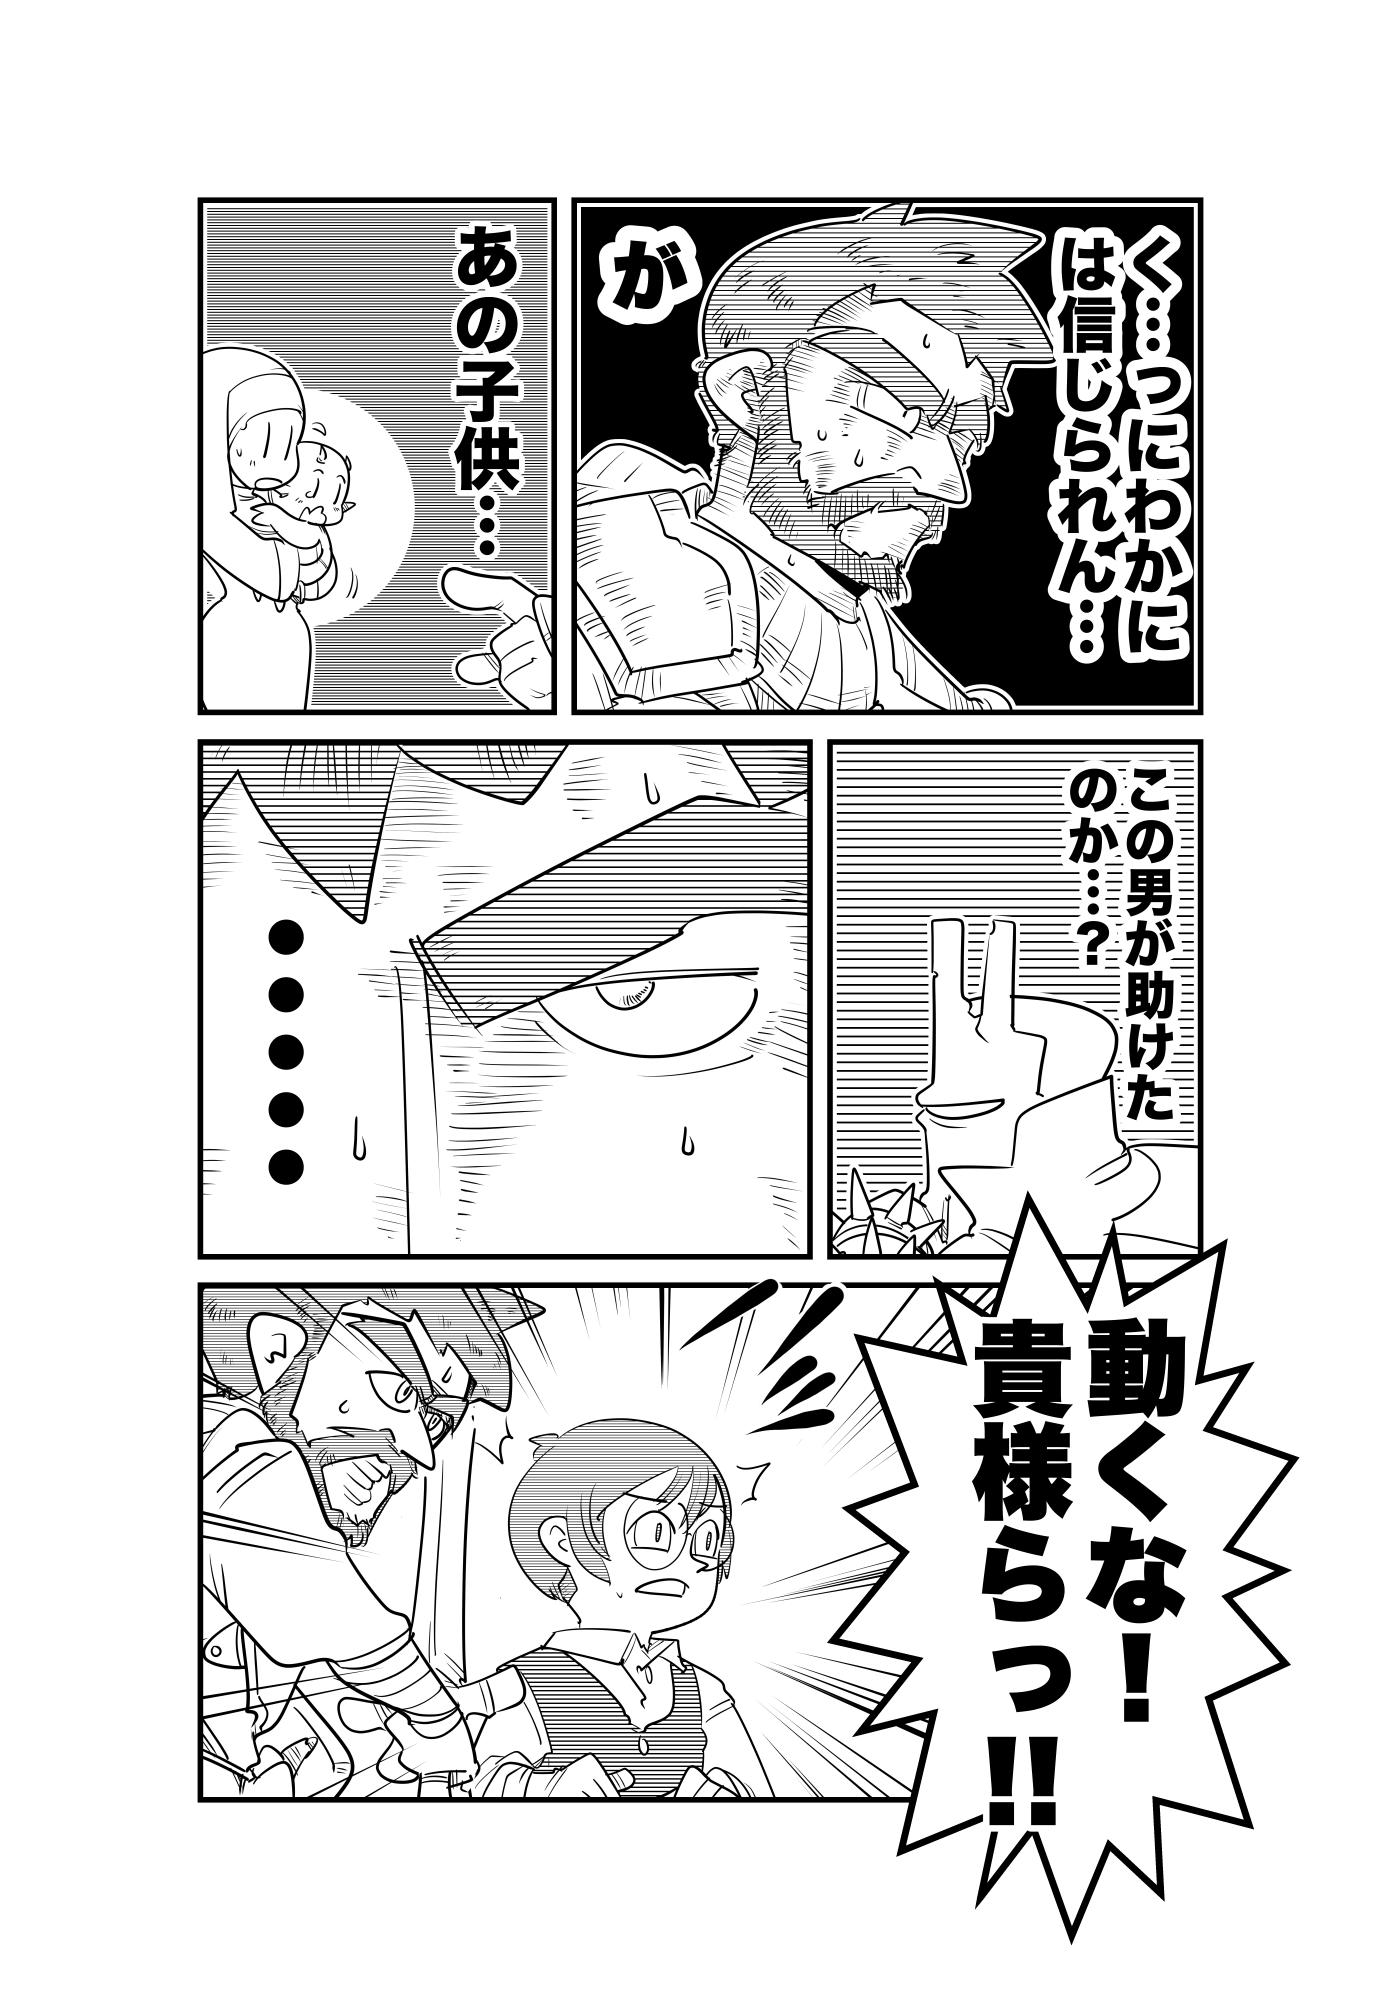 f:id:terashimaru117:20210914224152p:plain